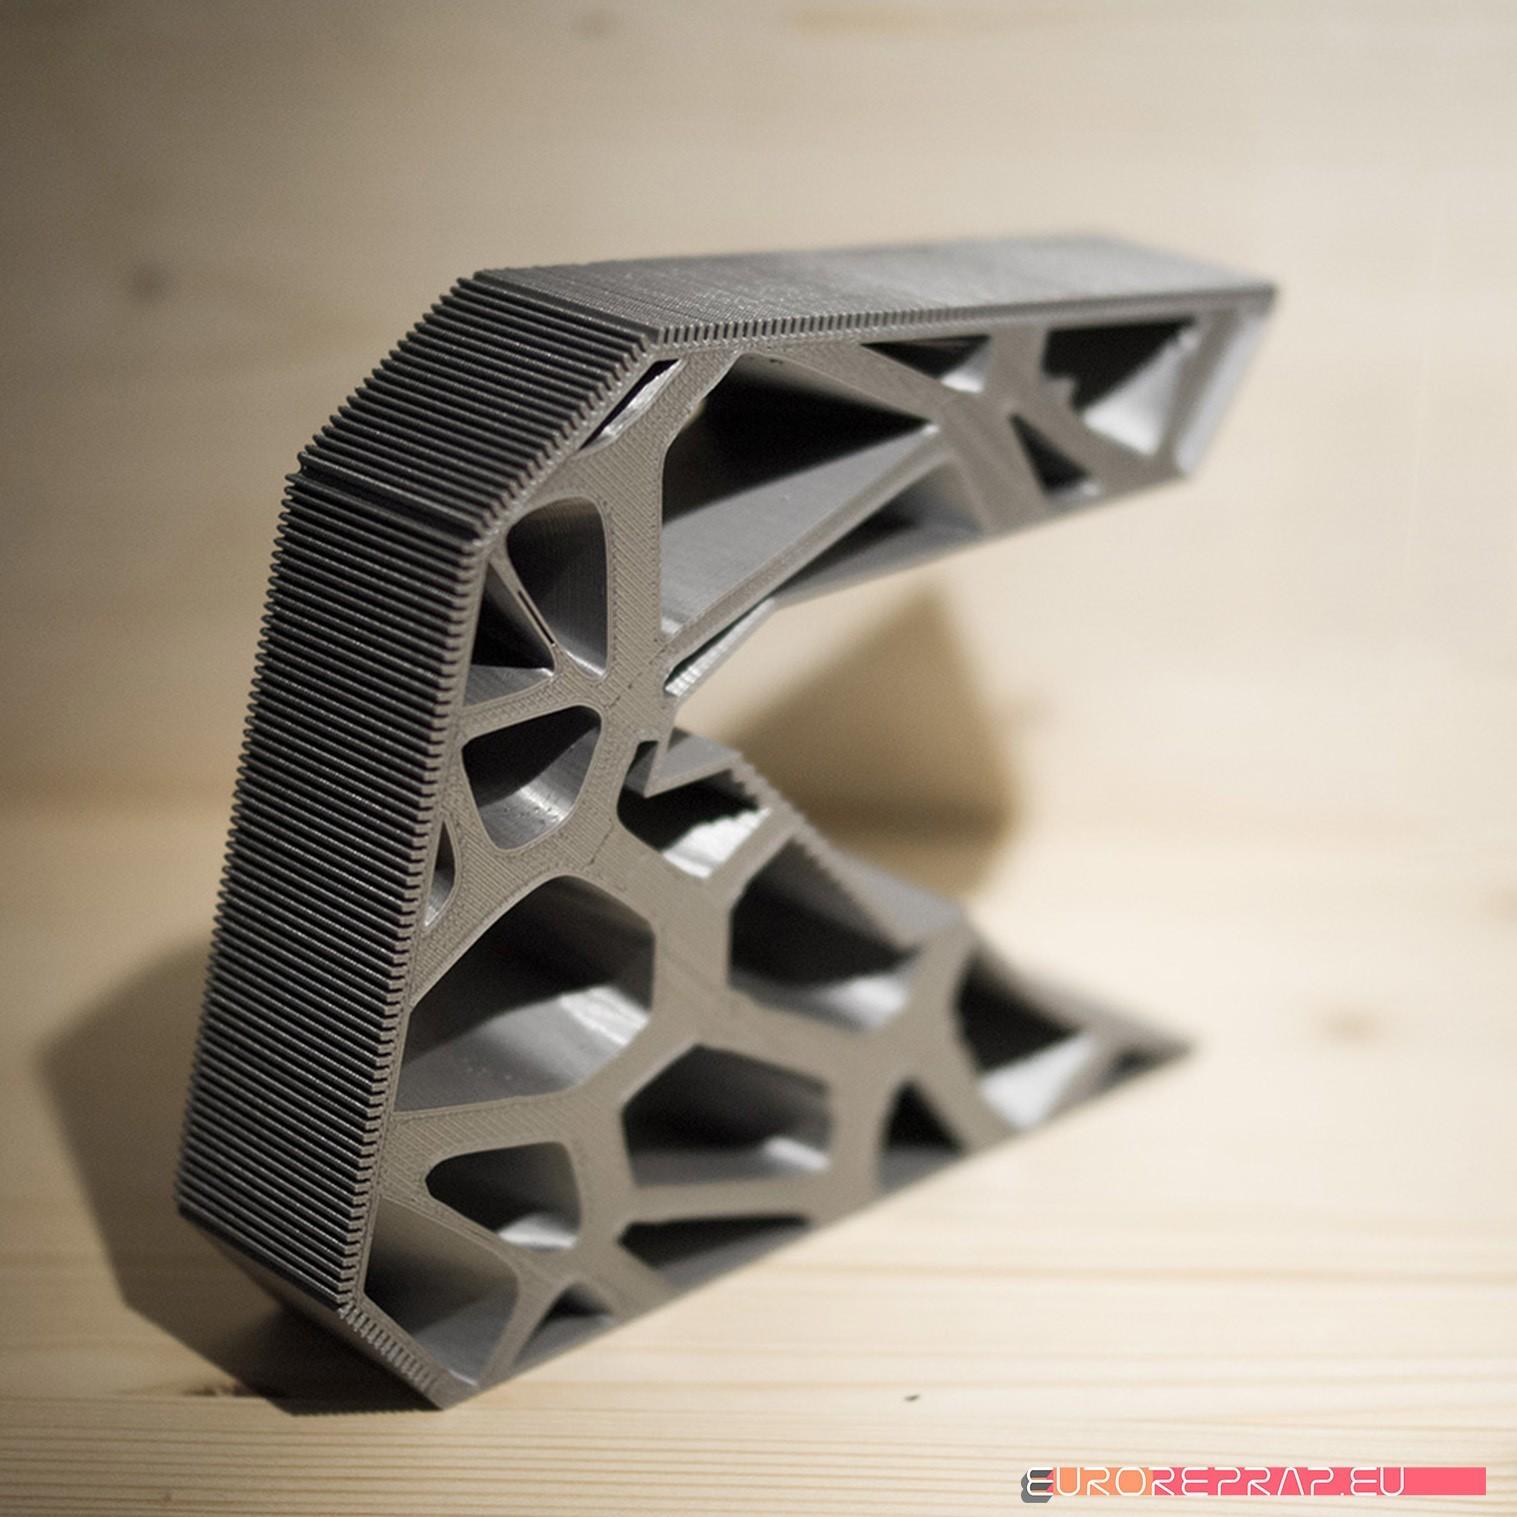 architecture example 4p.jpg Download STL file 3D printable architectural exhibition model 04 • 3D printer template, euroreprap_eu